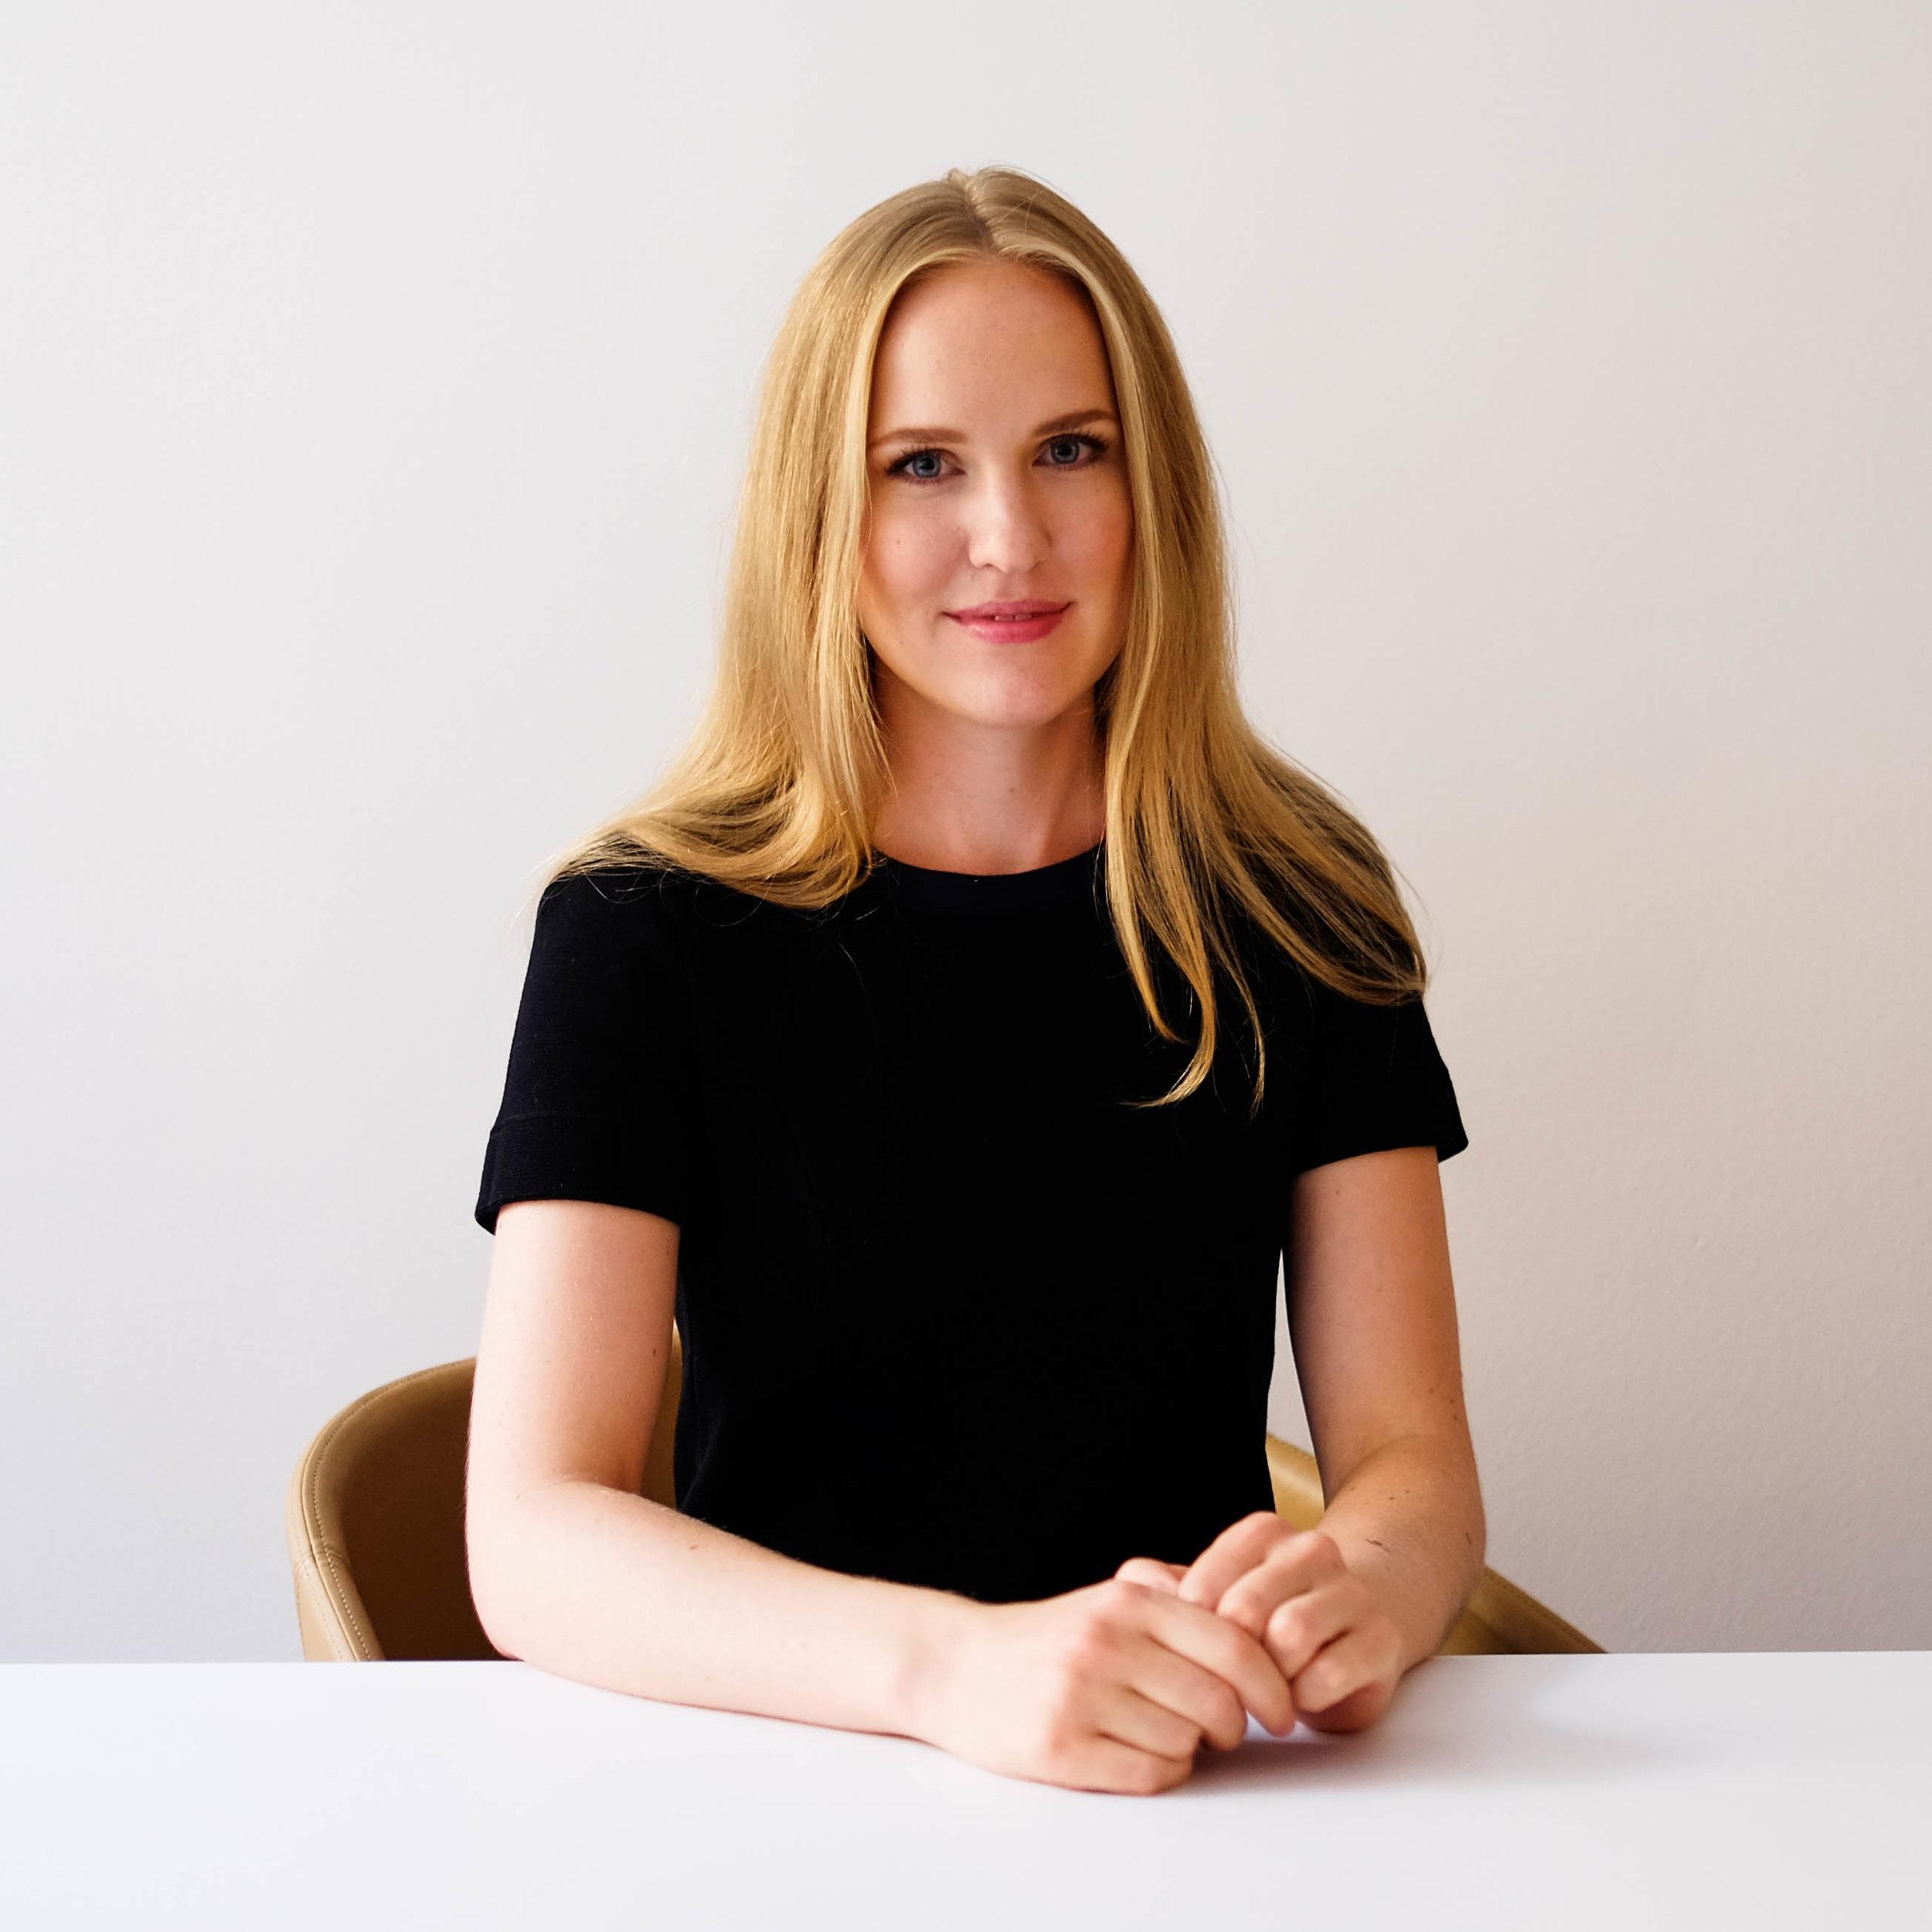 Karolina Sundell   Arkitekt MSA  karolina.sundell@elindersten.se +46(0)70-524 77 51